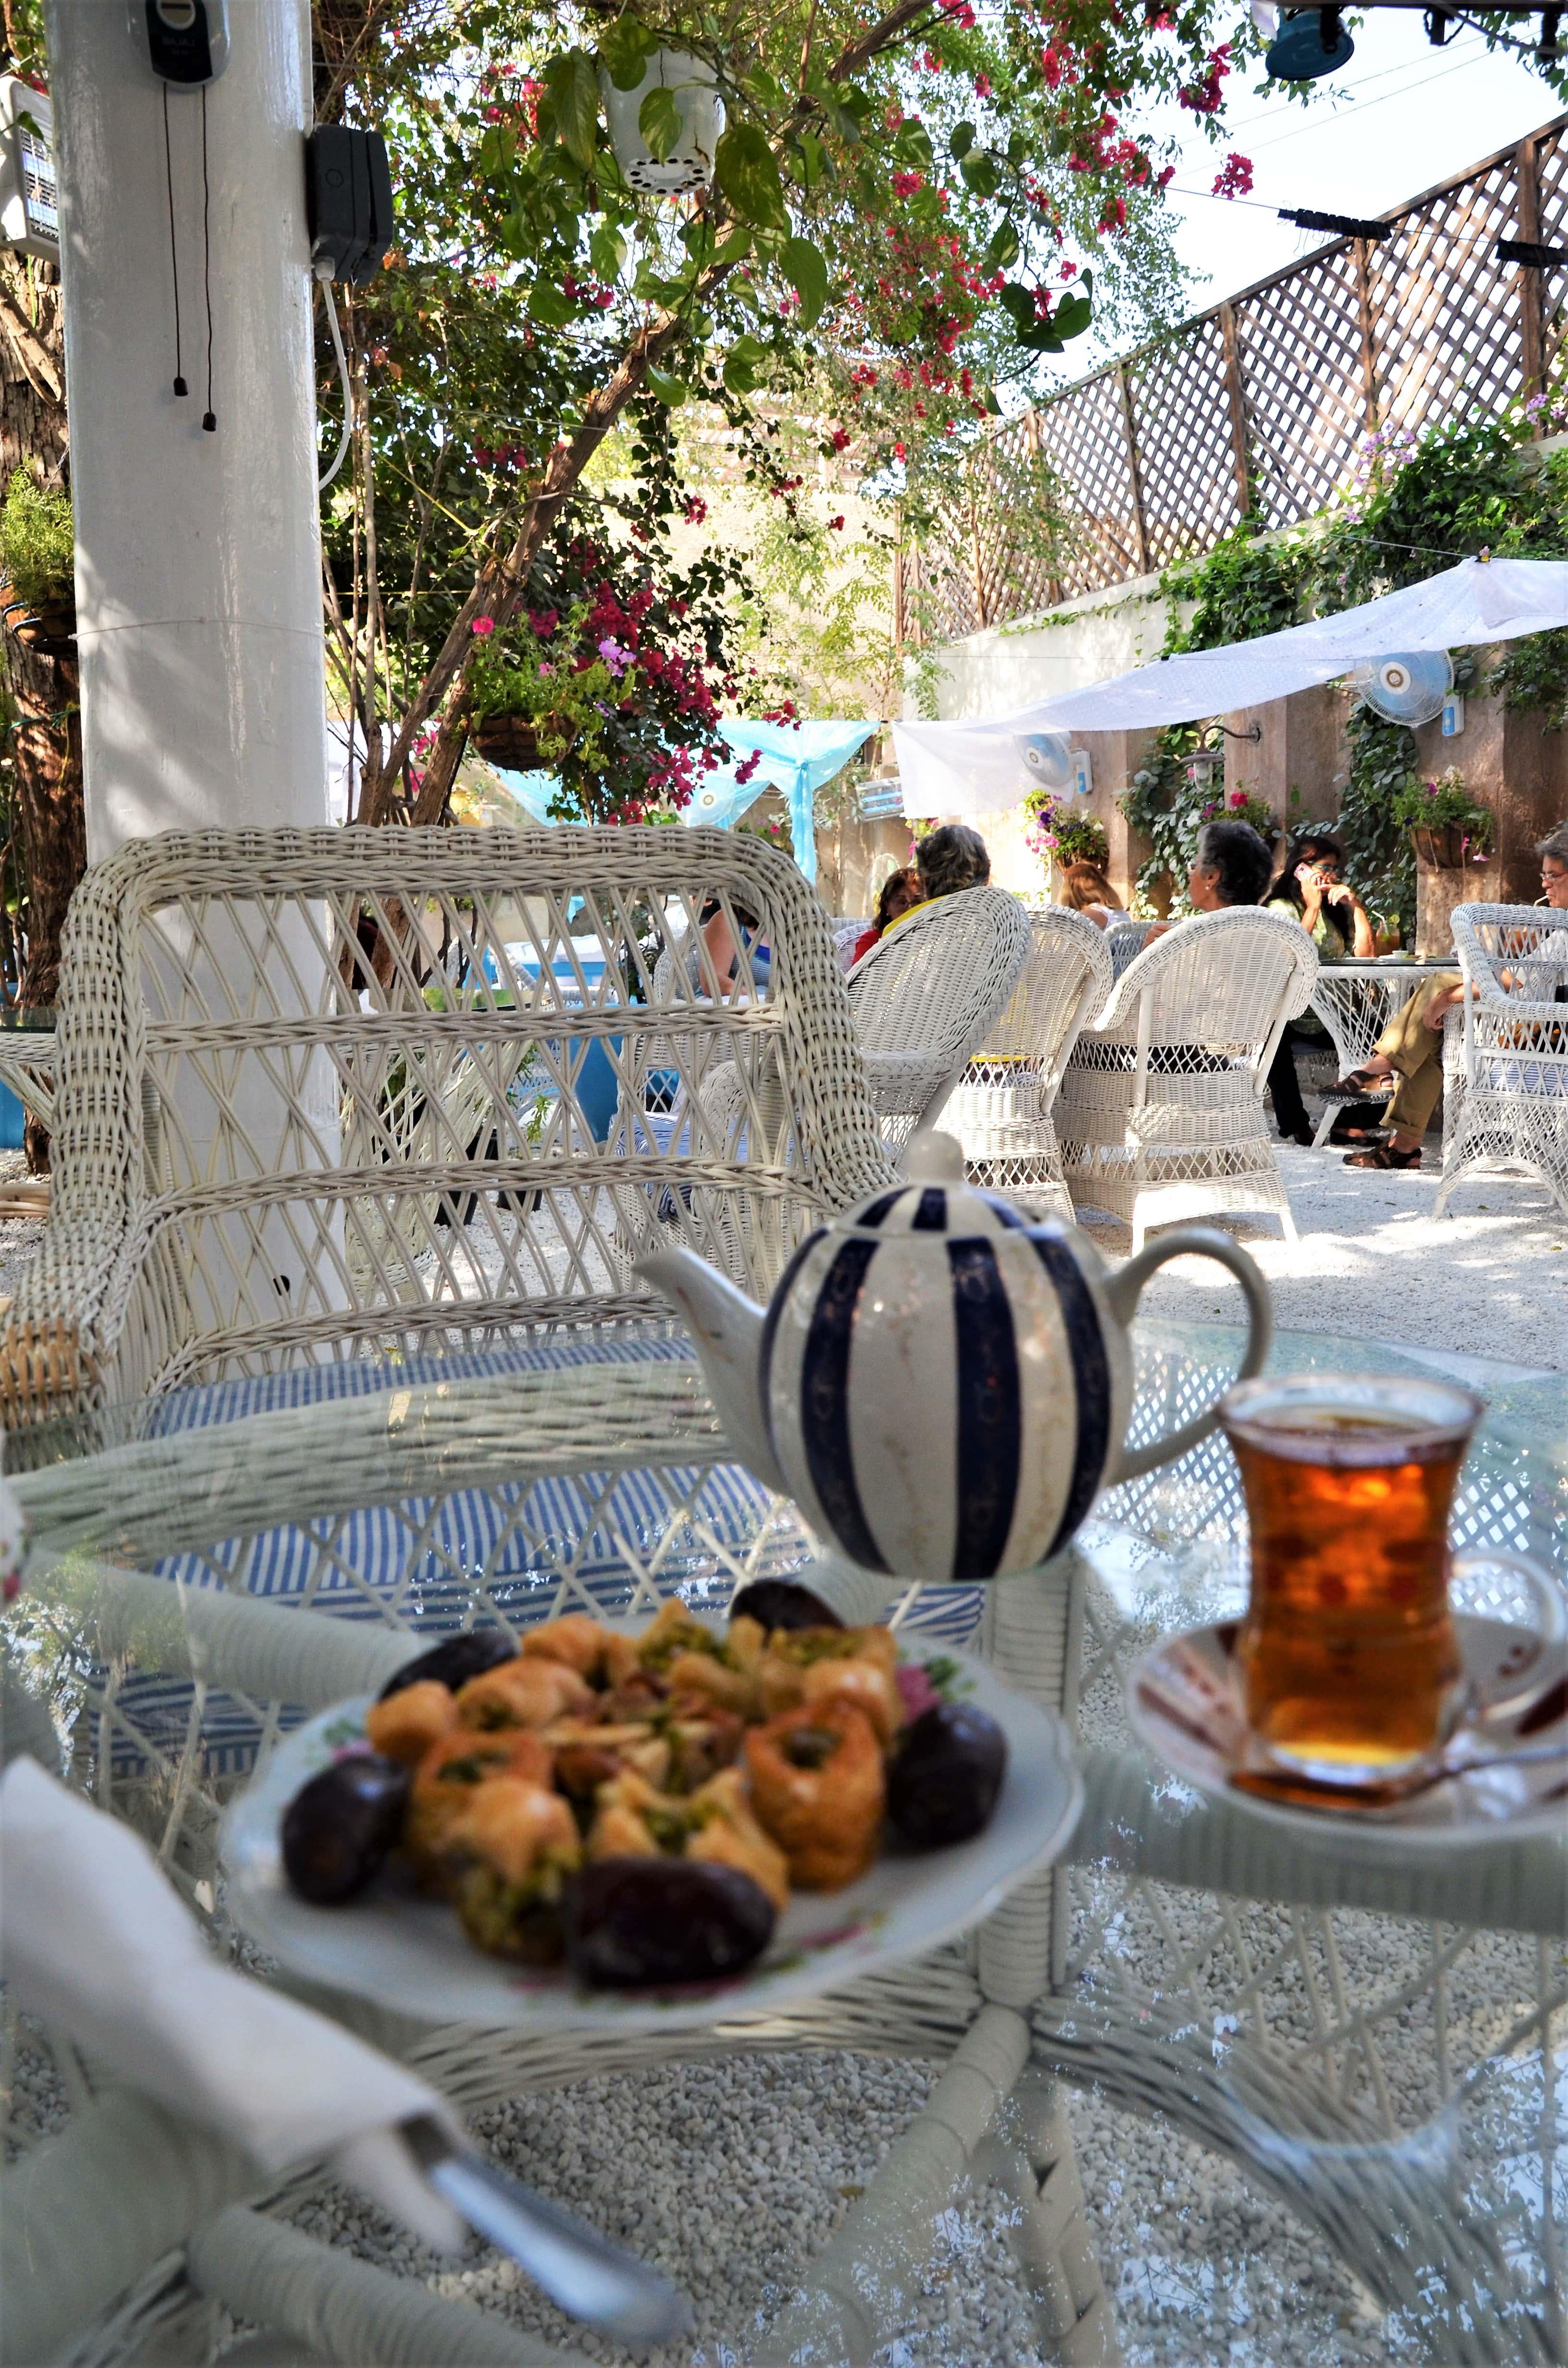 Tea and desert at the Arabian Tea House